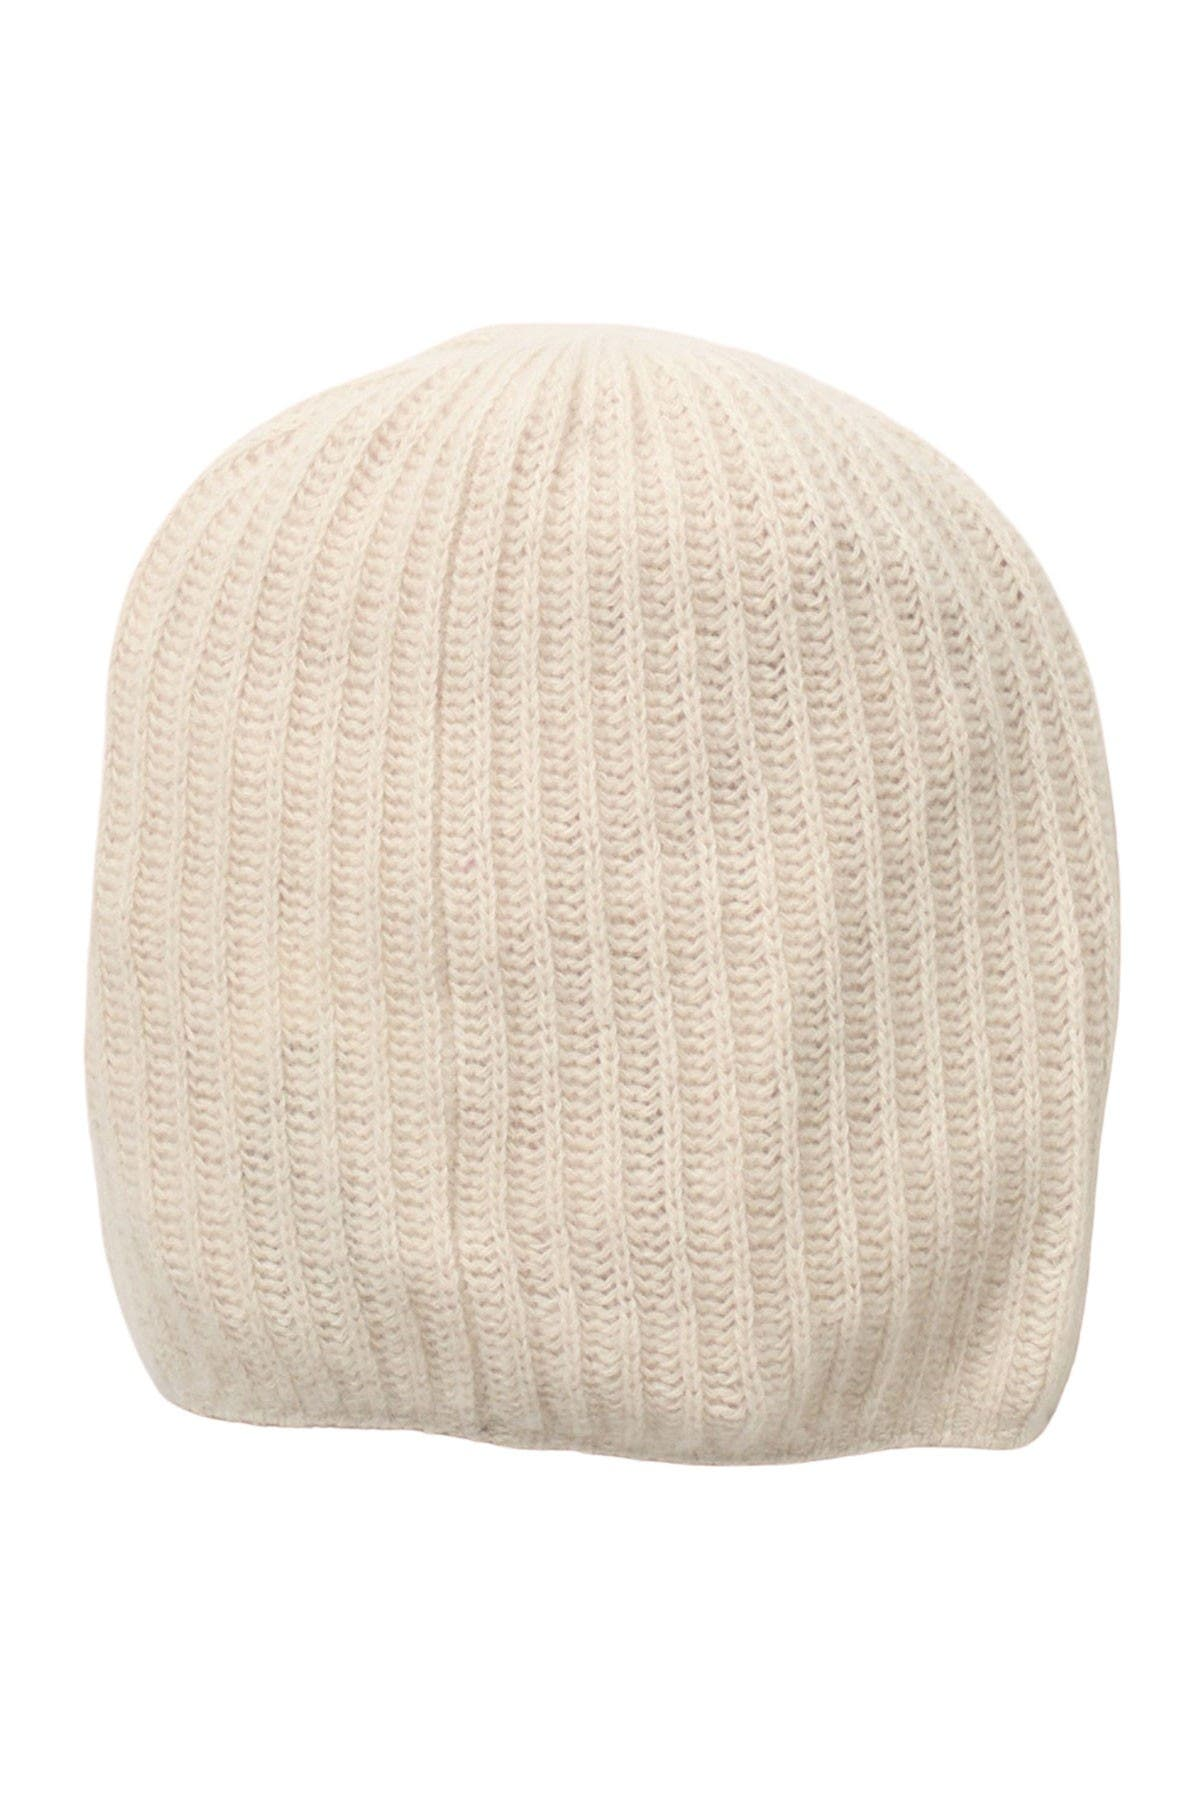 Image of Portolano Rib Knit Cashmere Beanie